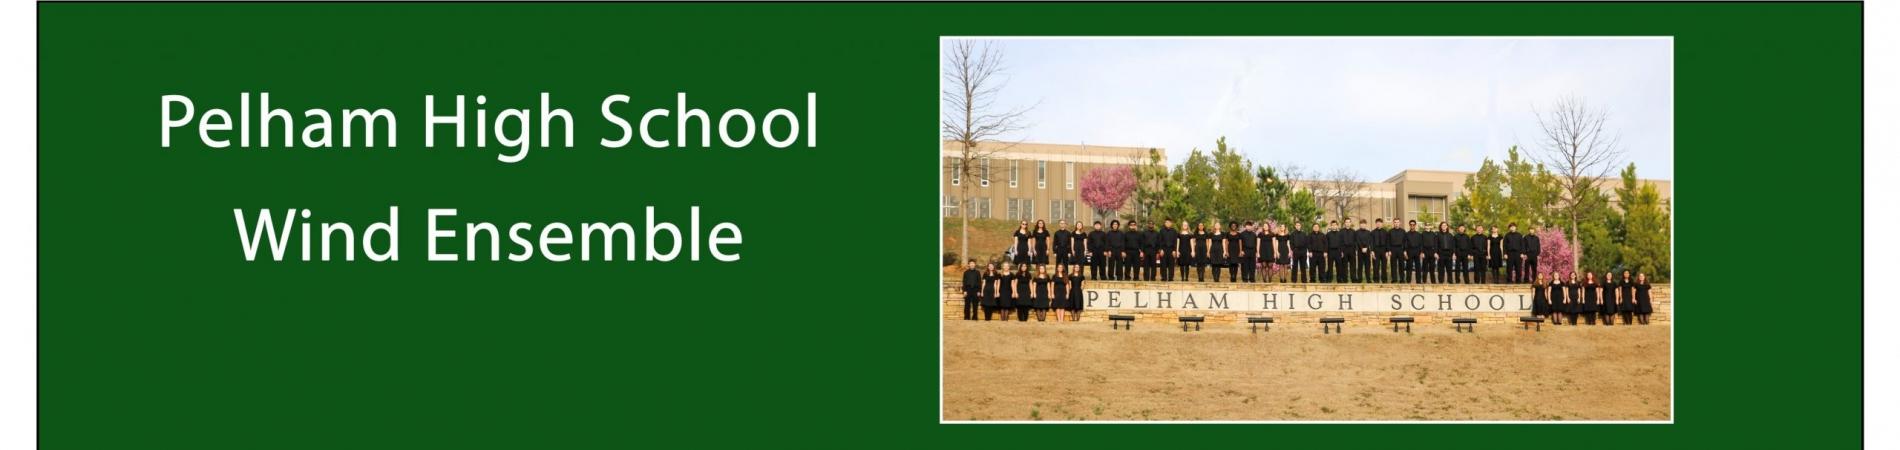 Pelham High School WE